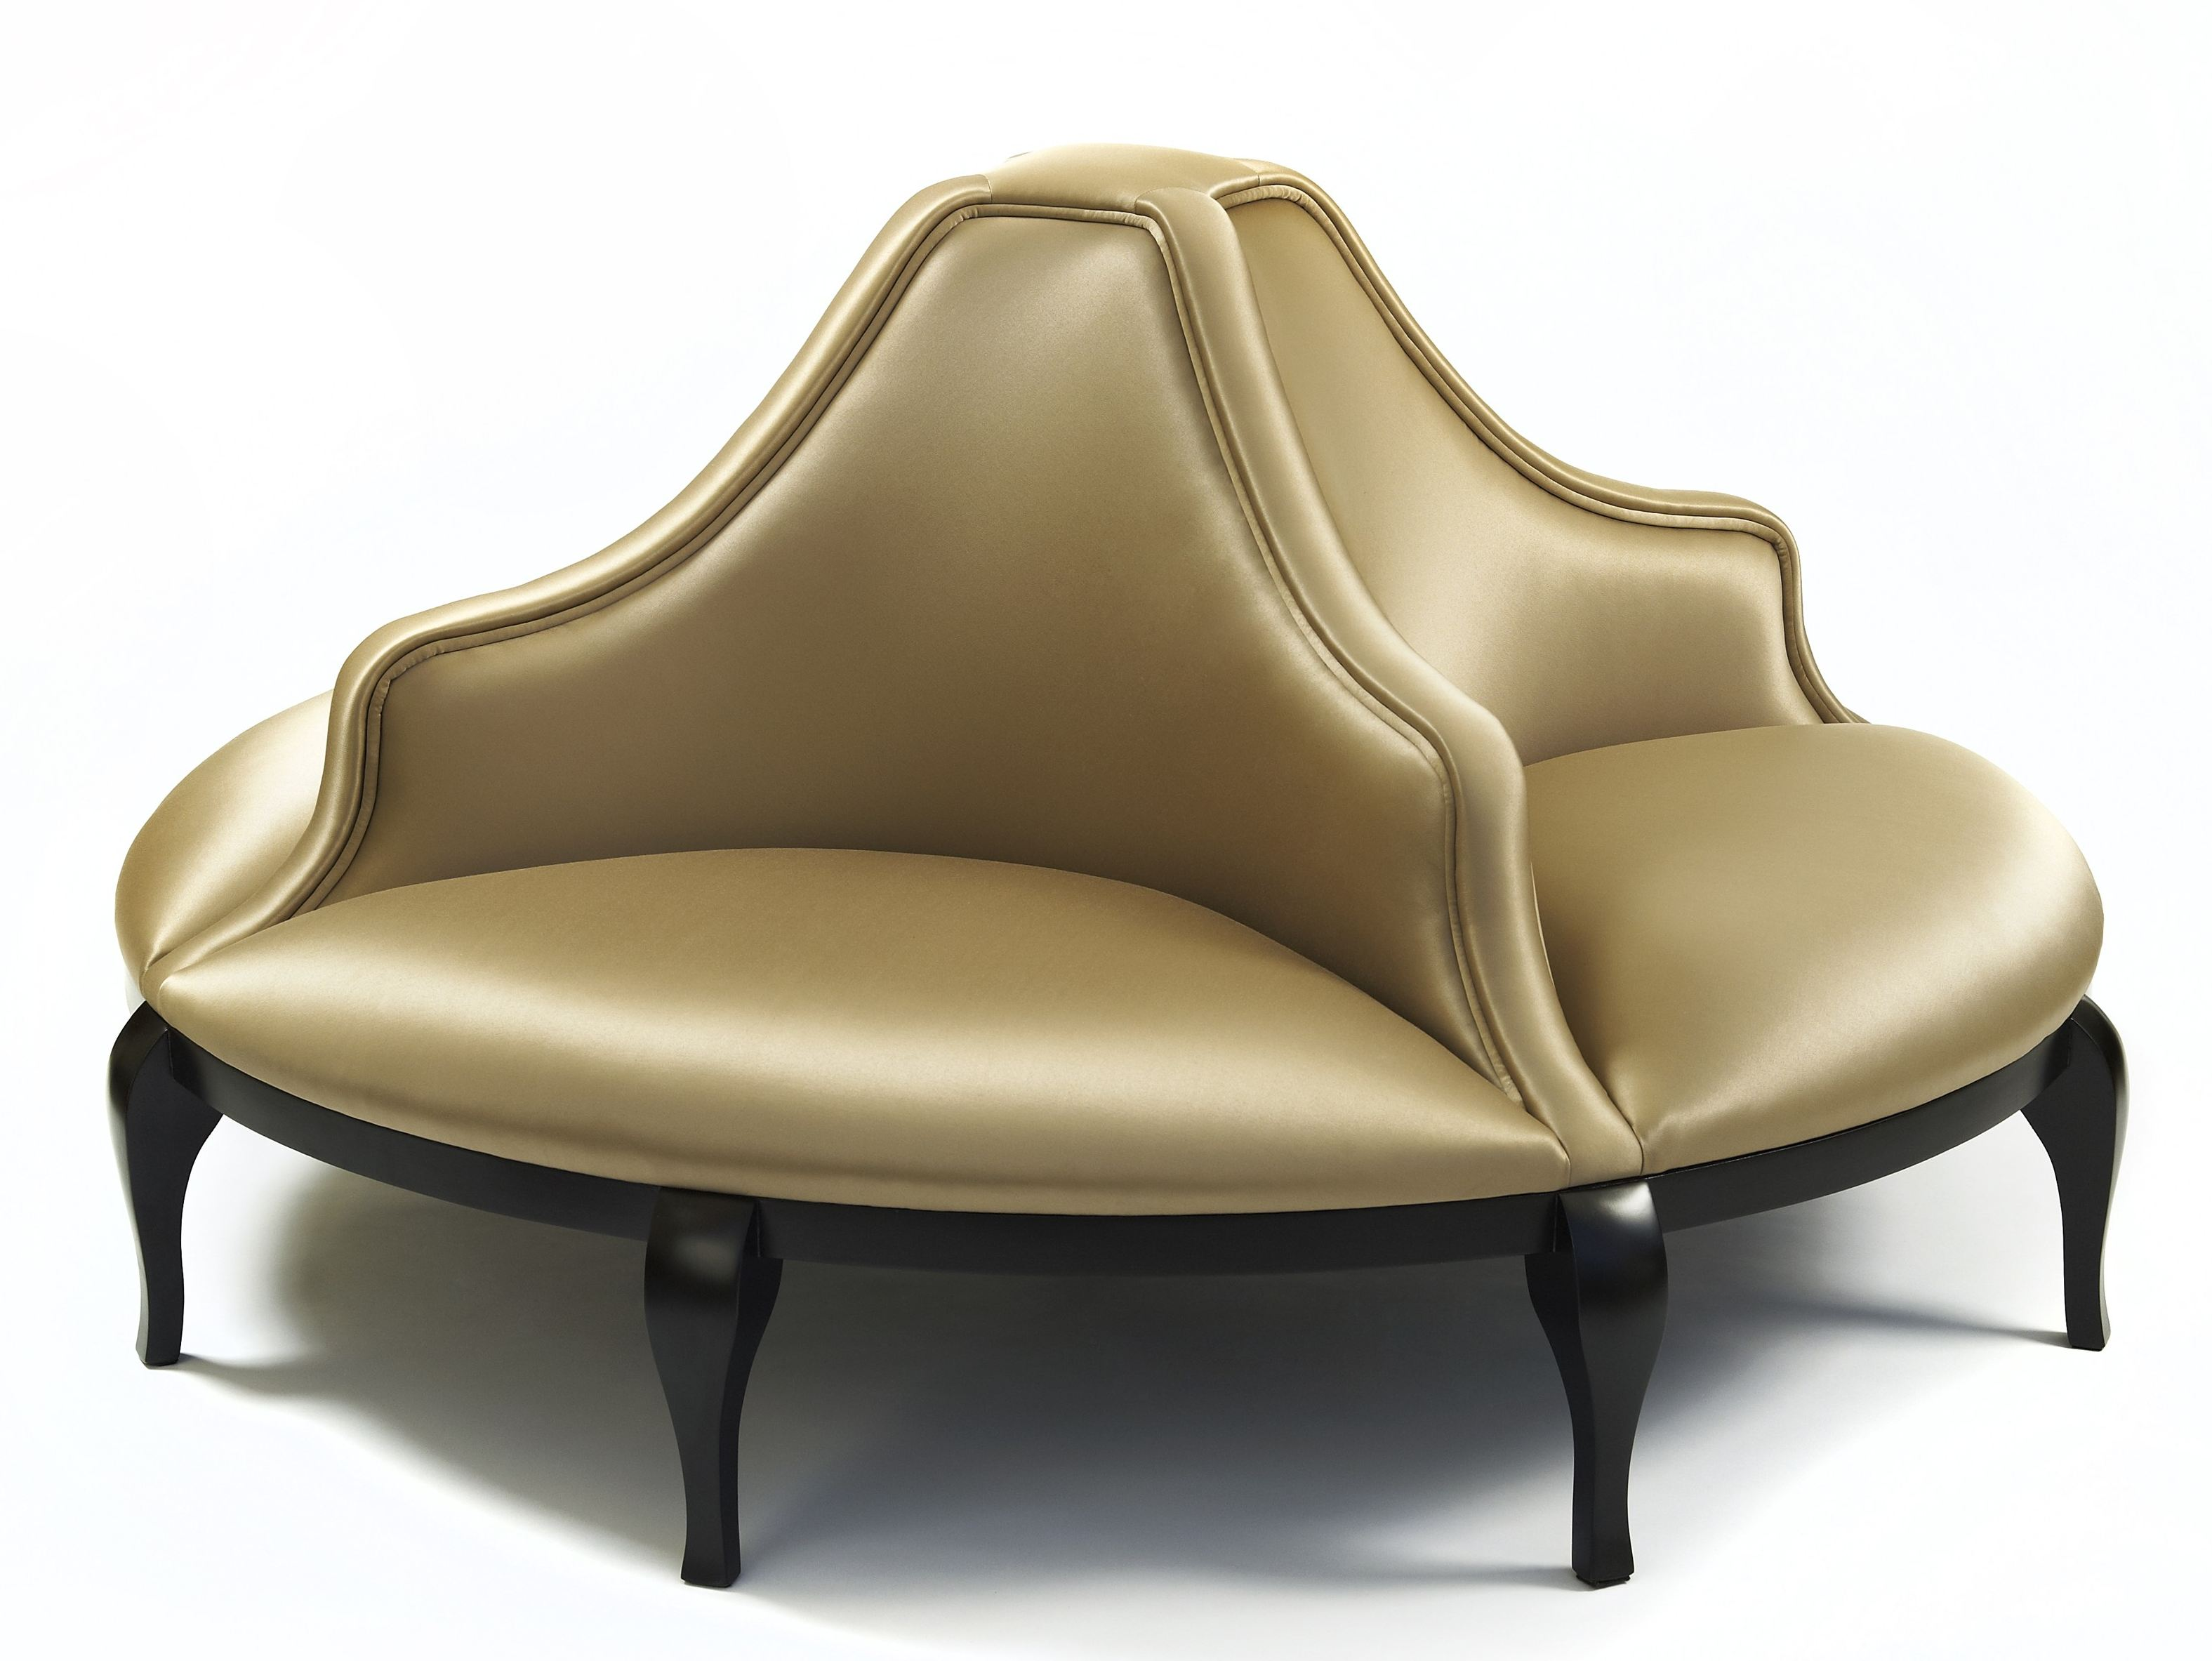 Round Upholstered Bench Madeleine By Munna